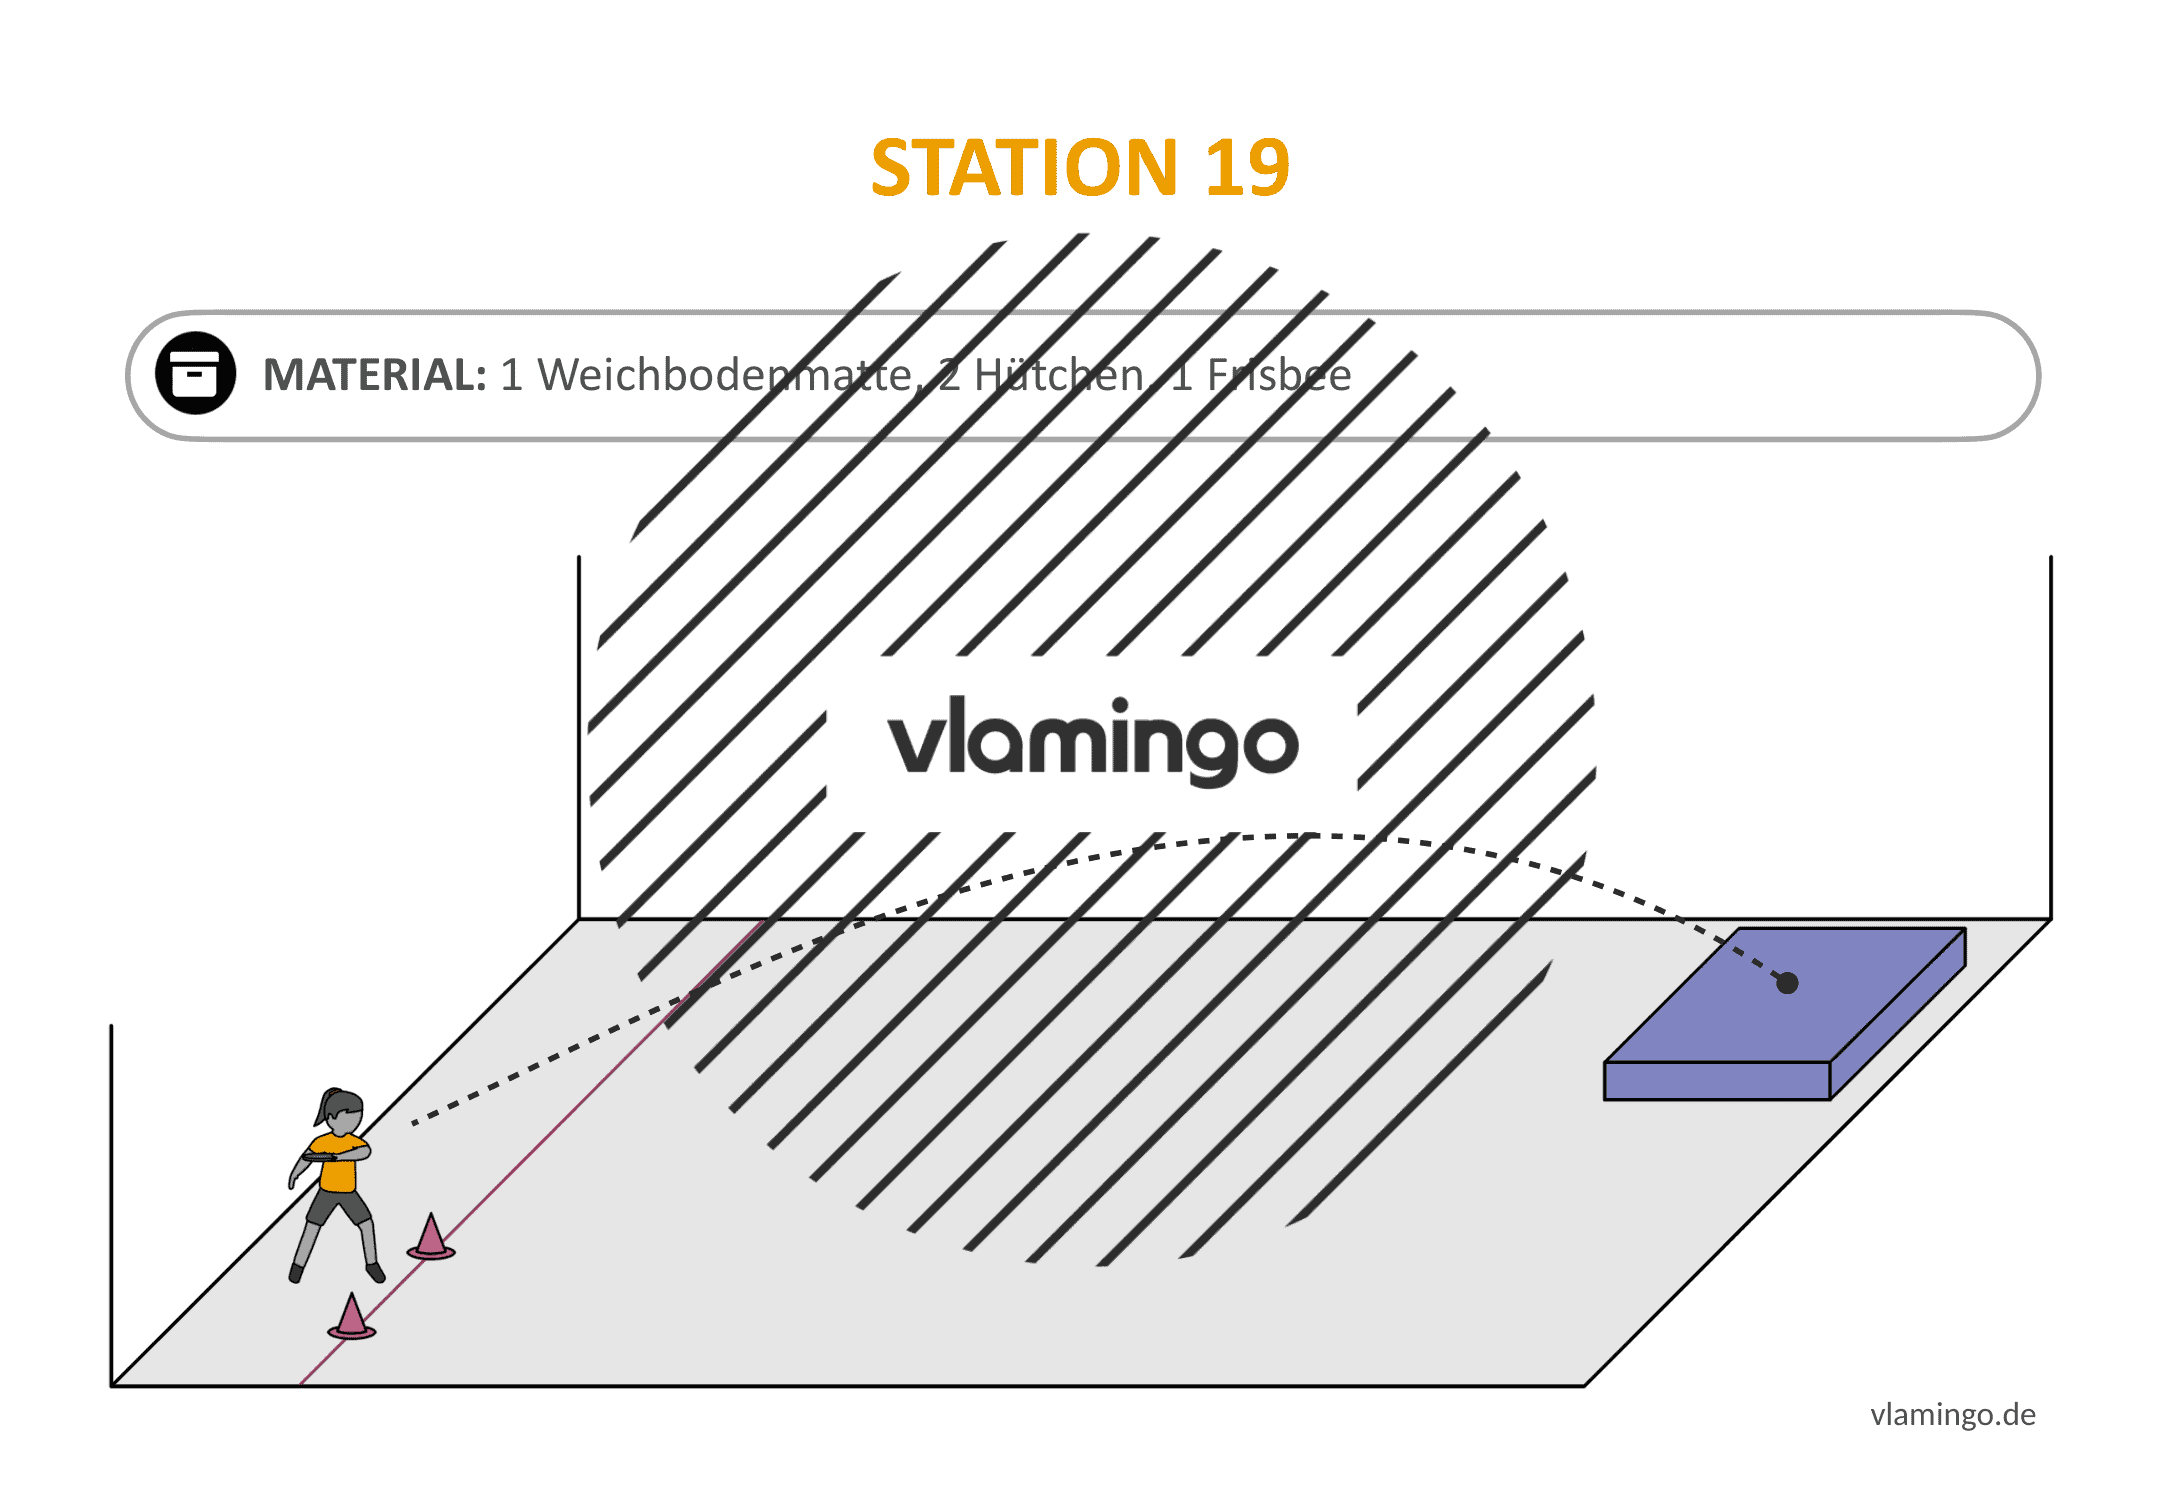 Frisbeegolf (Disc-Golf) - Station 19